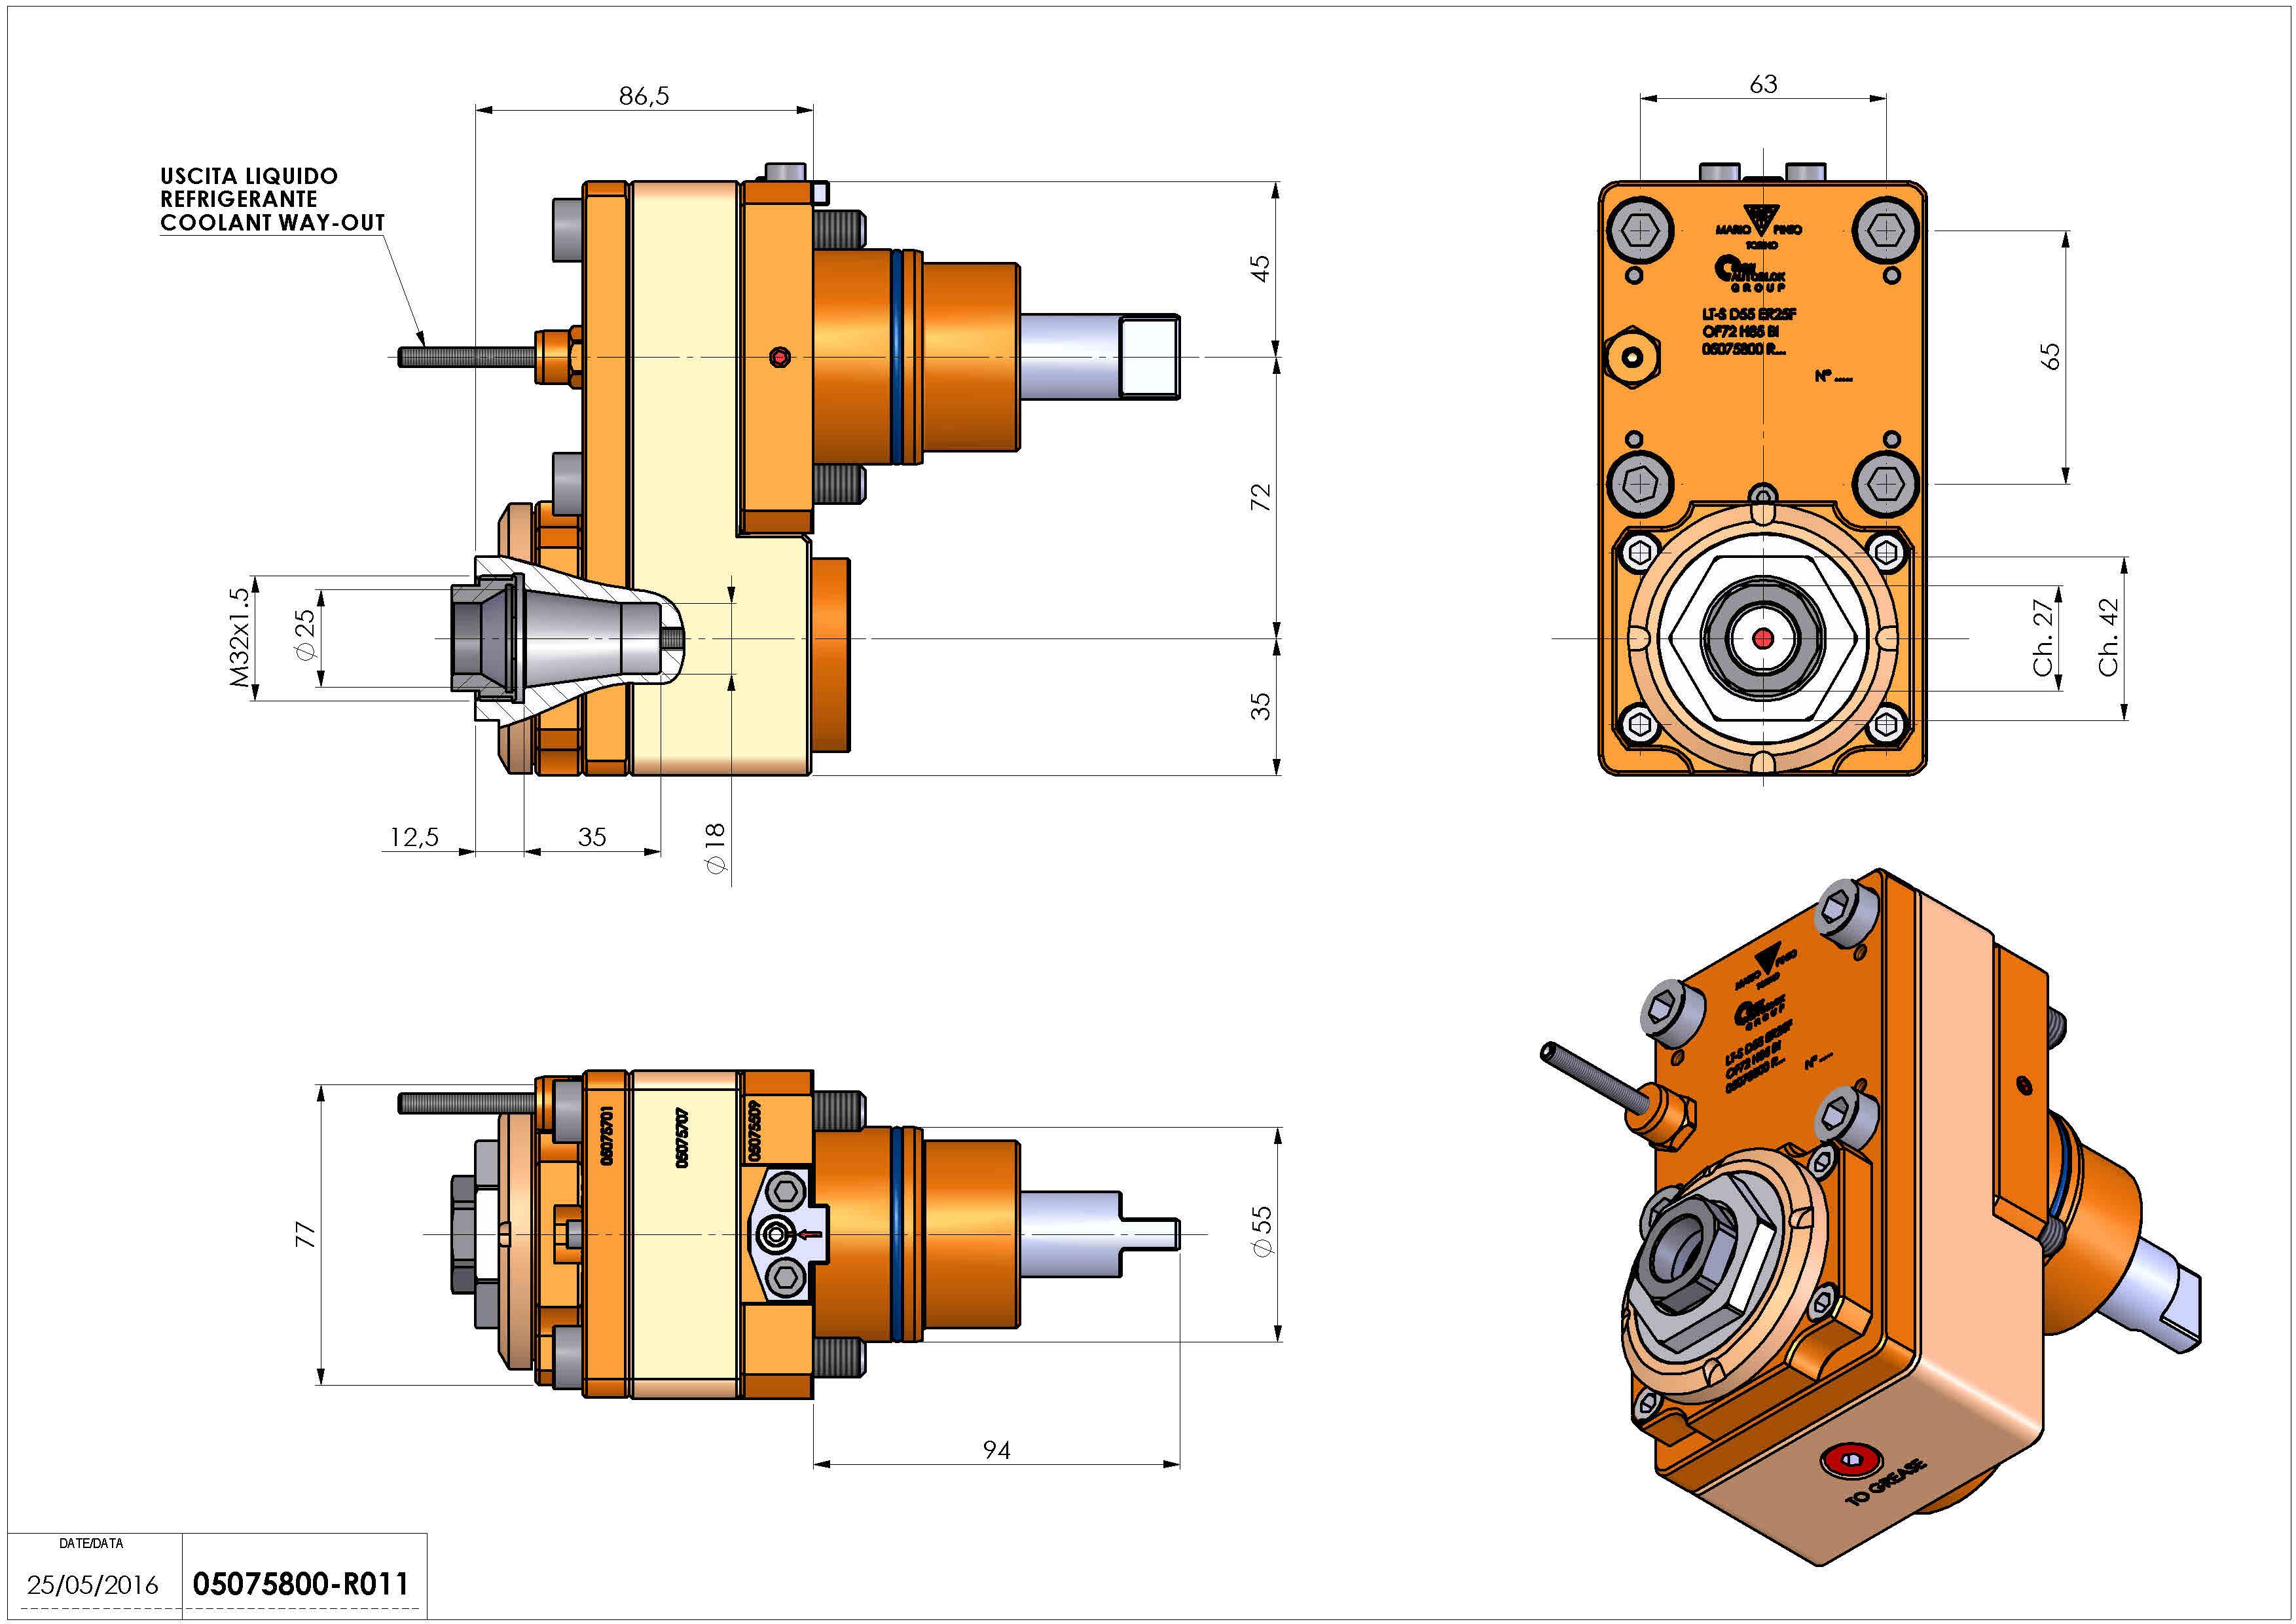 Technical image - LT-S D55 ER25F OF72 H86 BI.